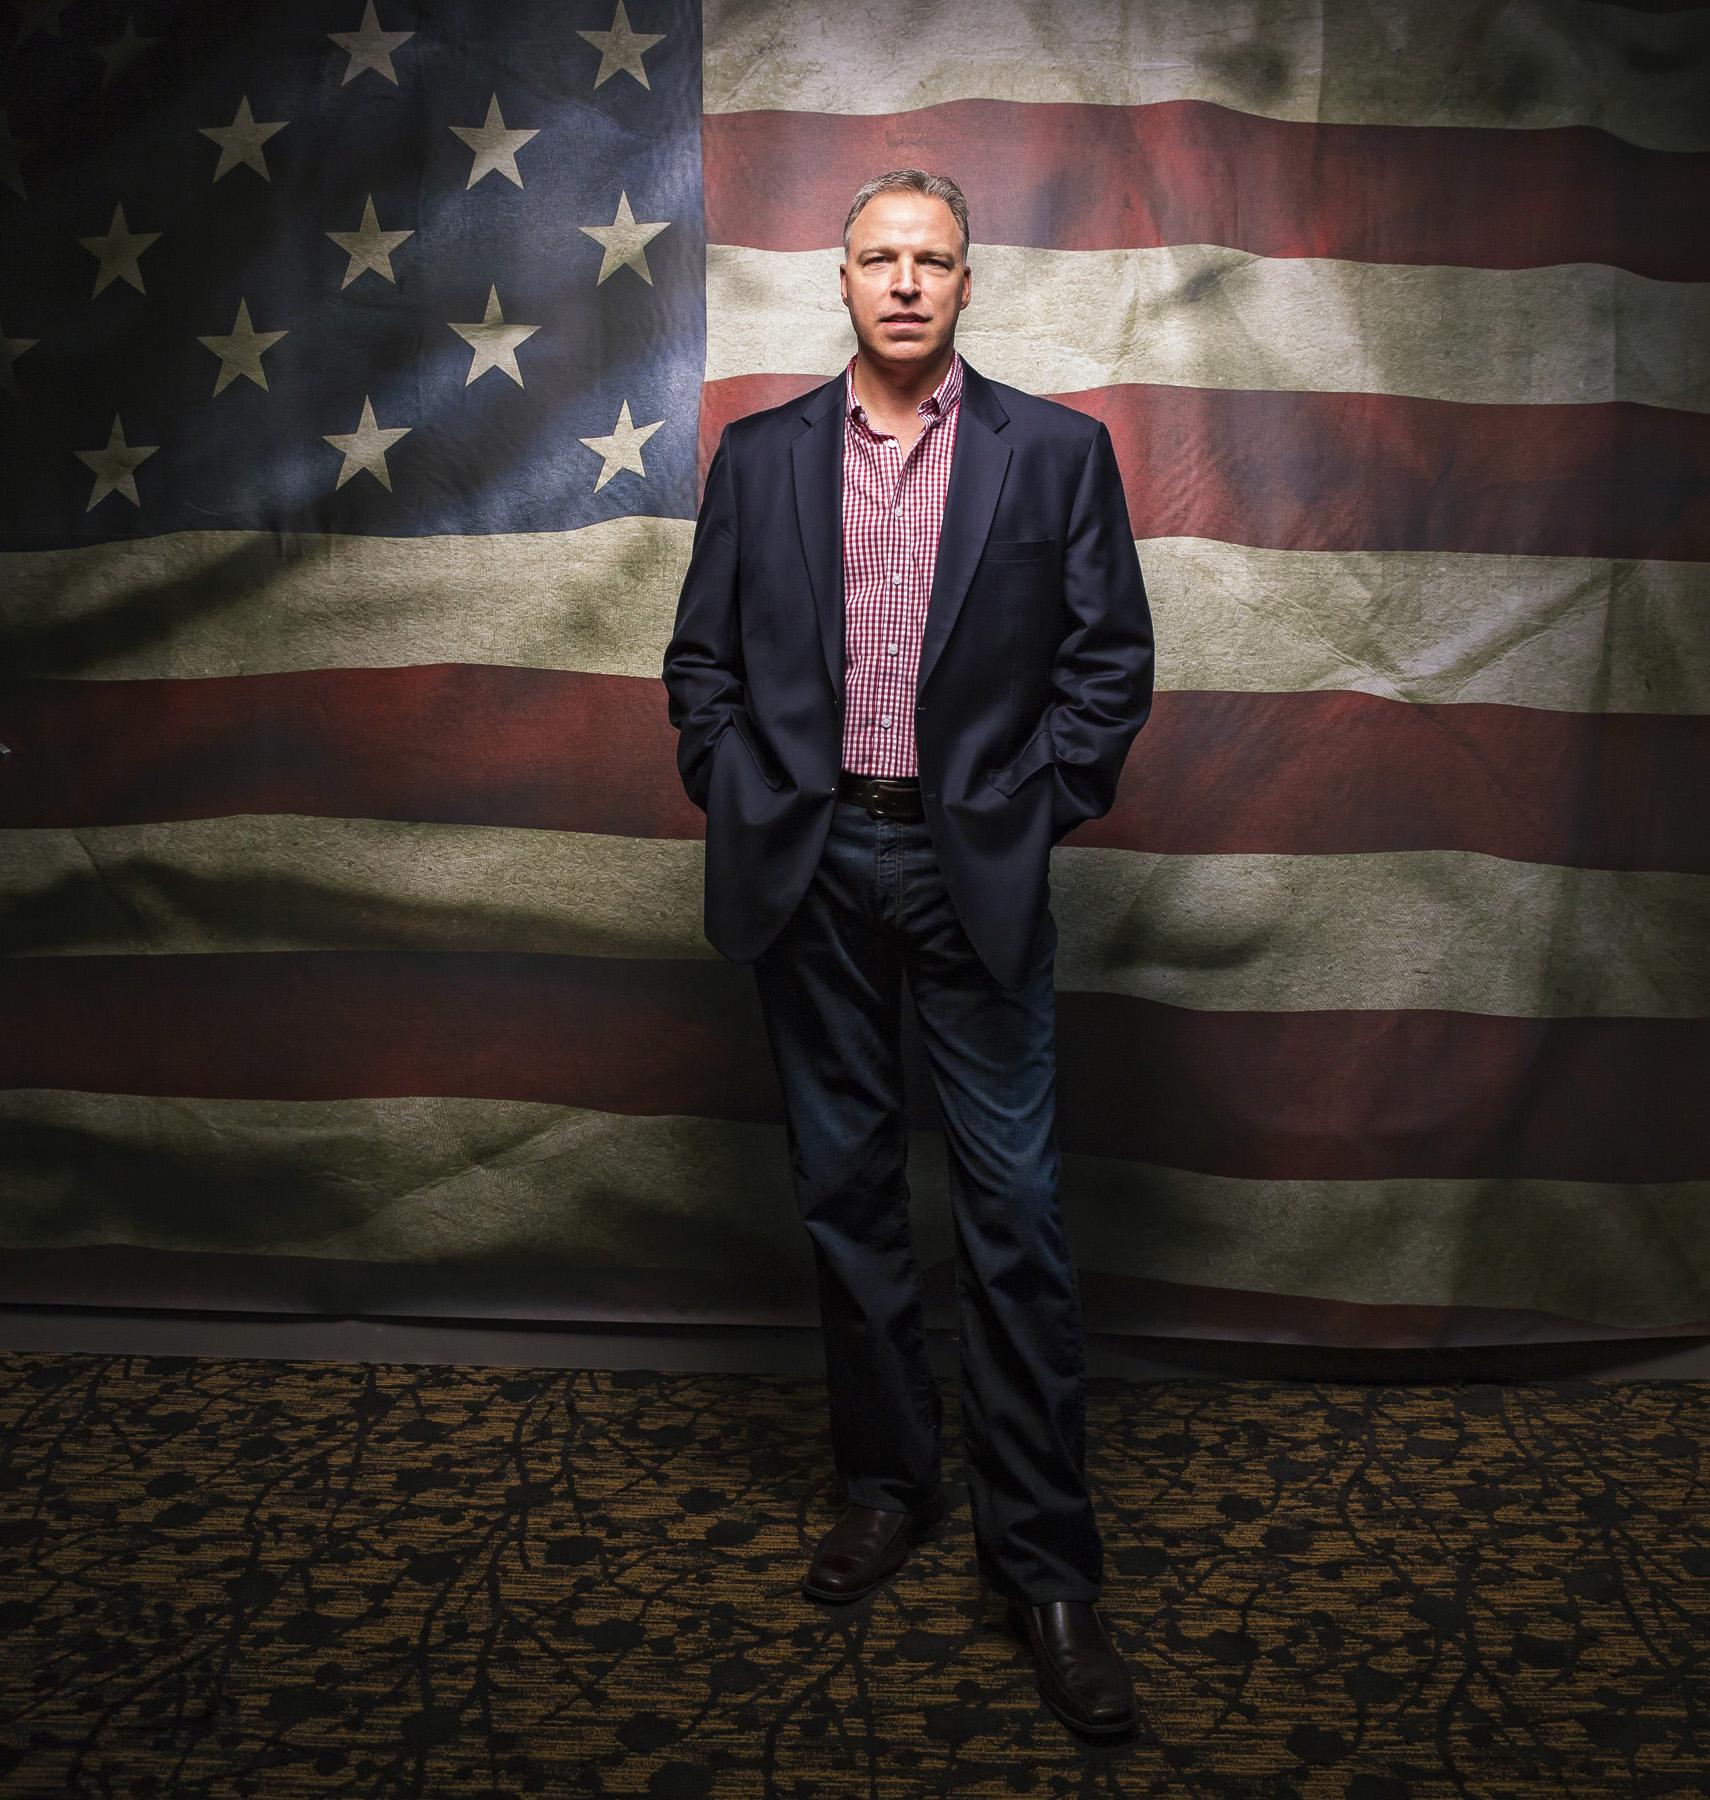 Broughton_Portrait_American_Flag-Crop_2265_V-3.jpg